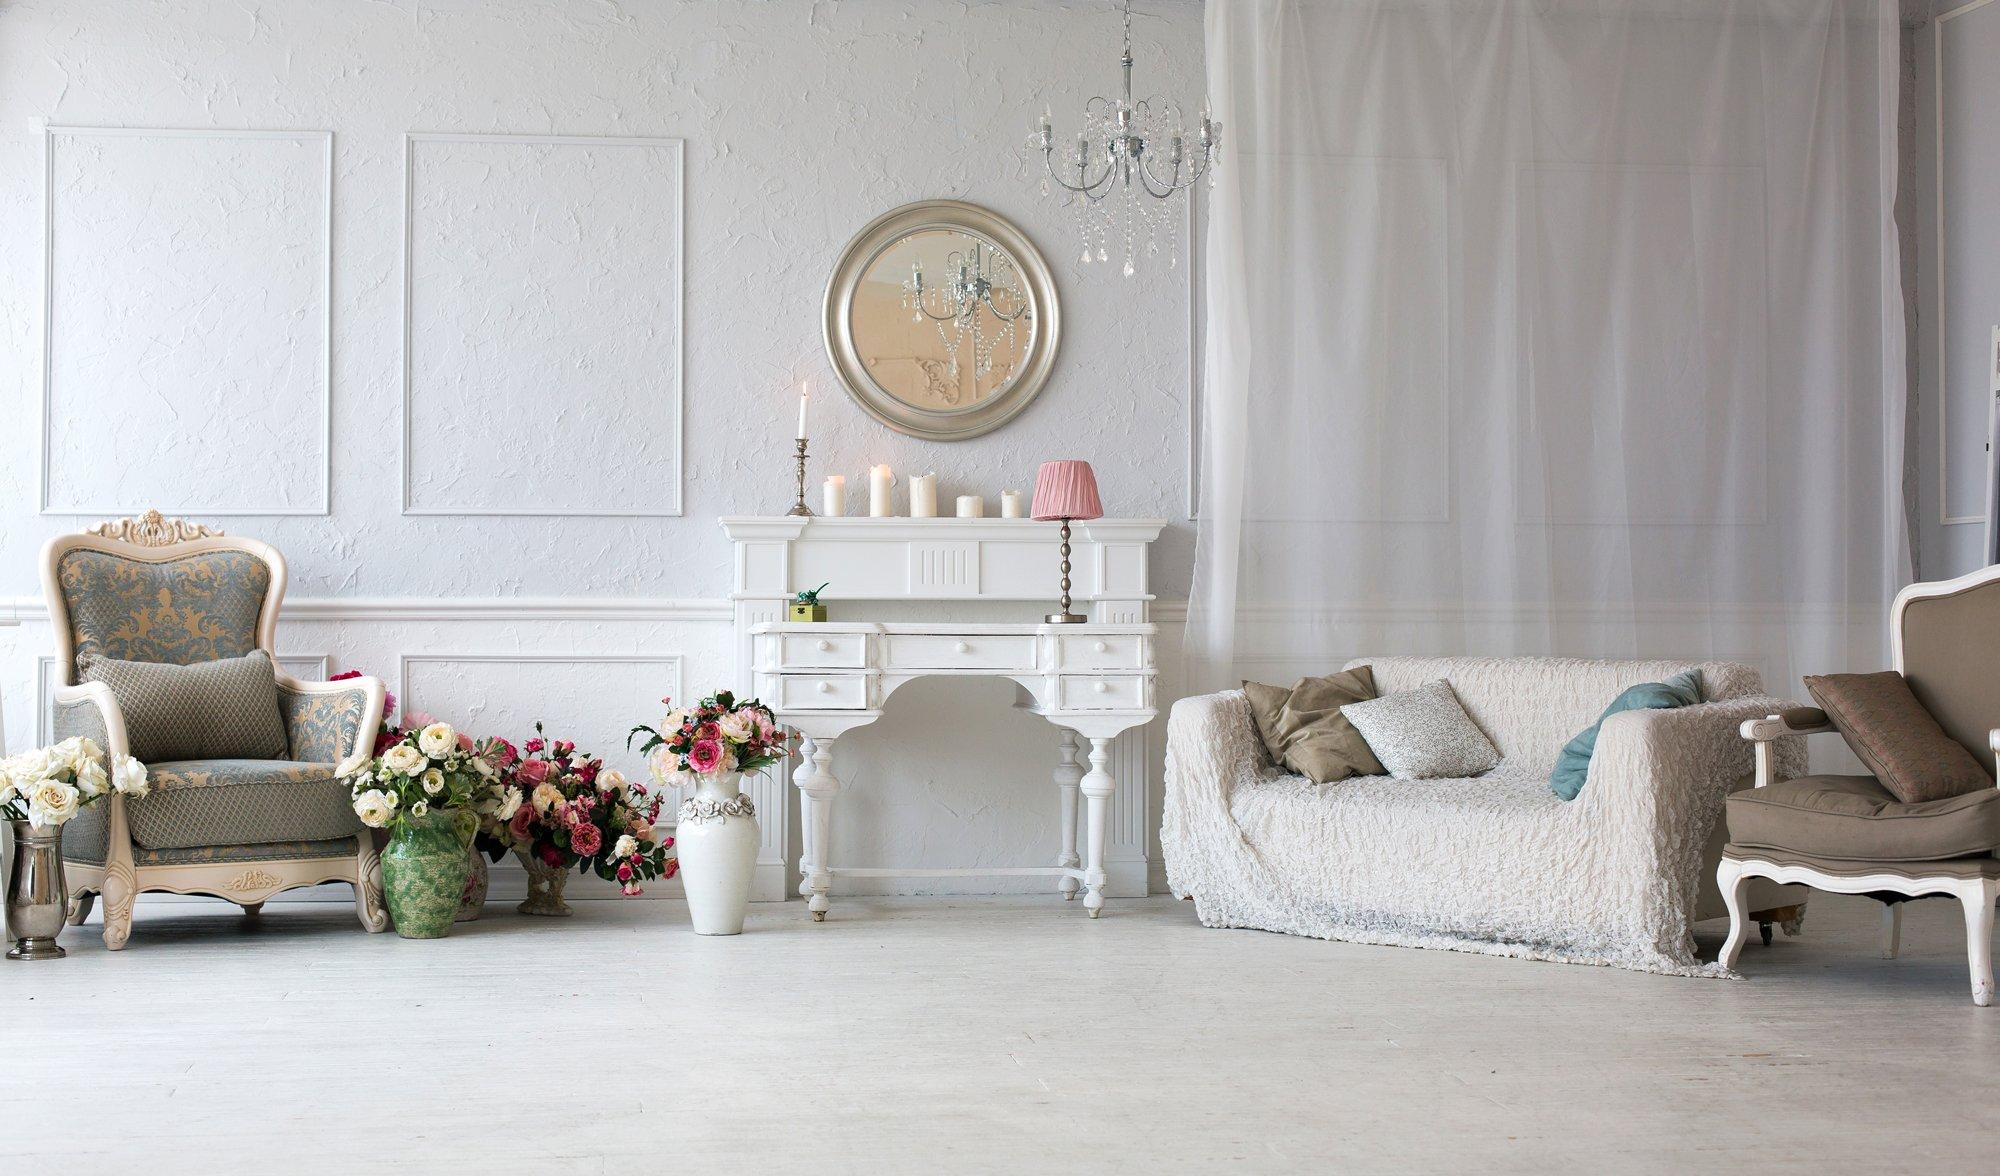 Luxury showroom with vintage furniture